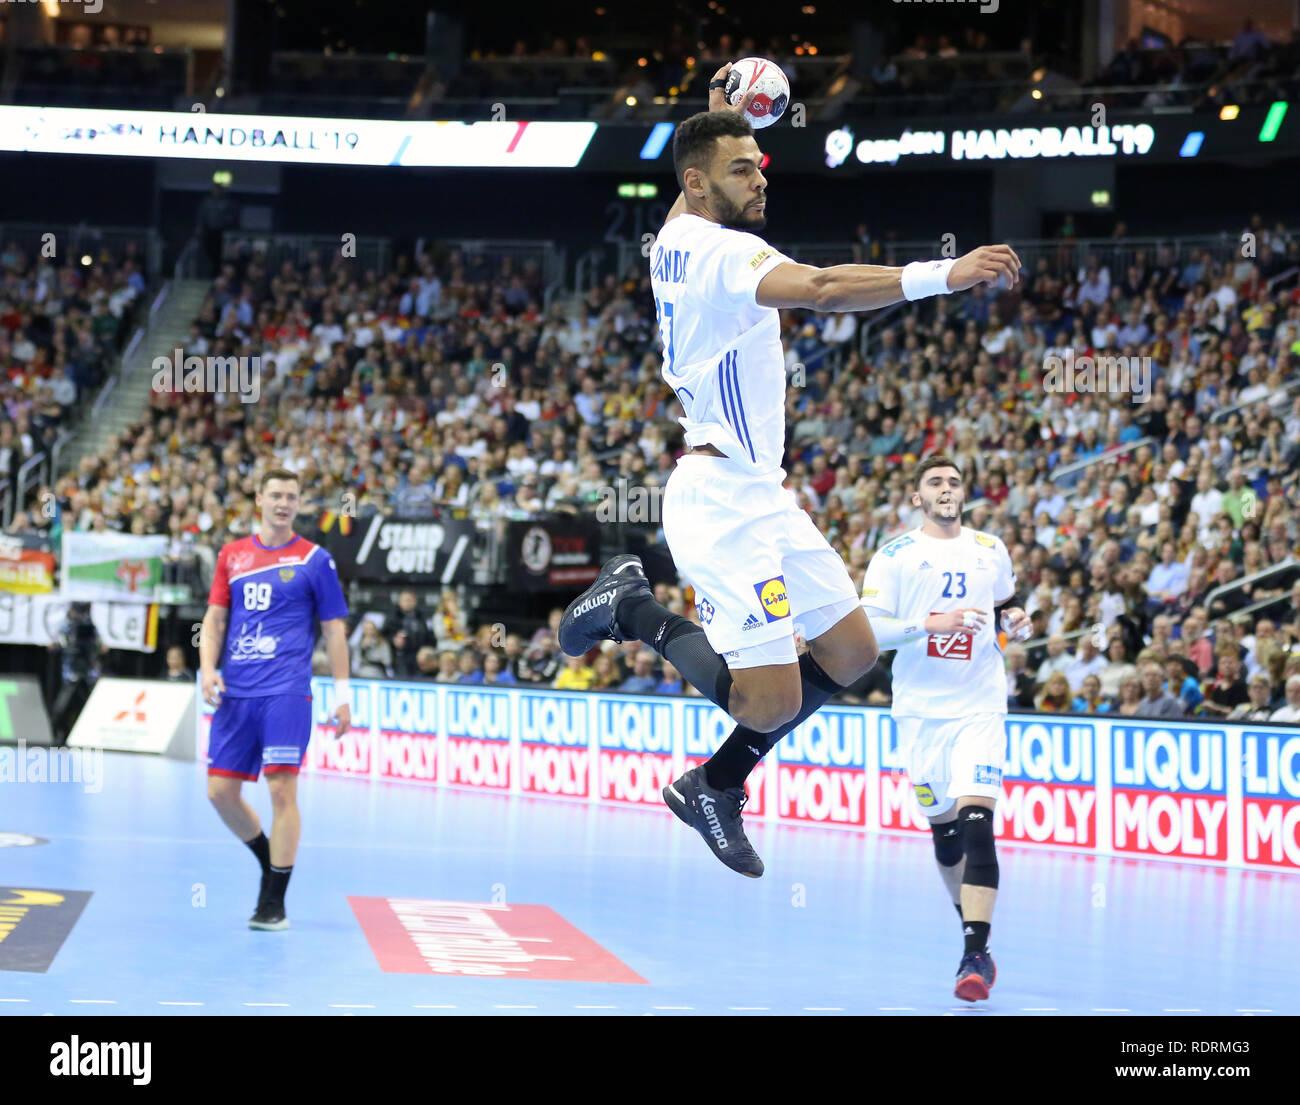 Germany. Berlin, Germany. 17th Jan 2019. IHF Handball Men's World Championship, Berlin, Germany.Adrien Dipanda for France Credit: Mickael Chavet/Alamy Live News - Stock Image